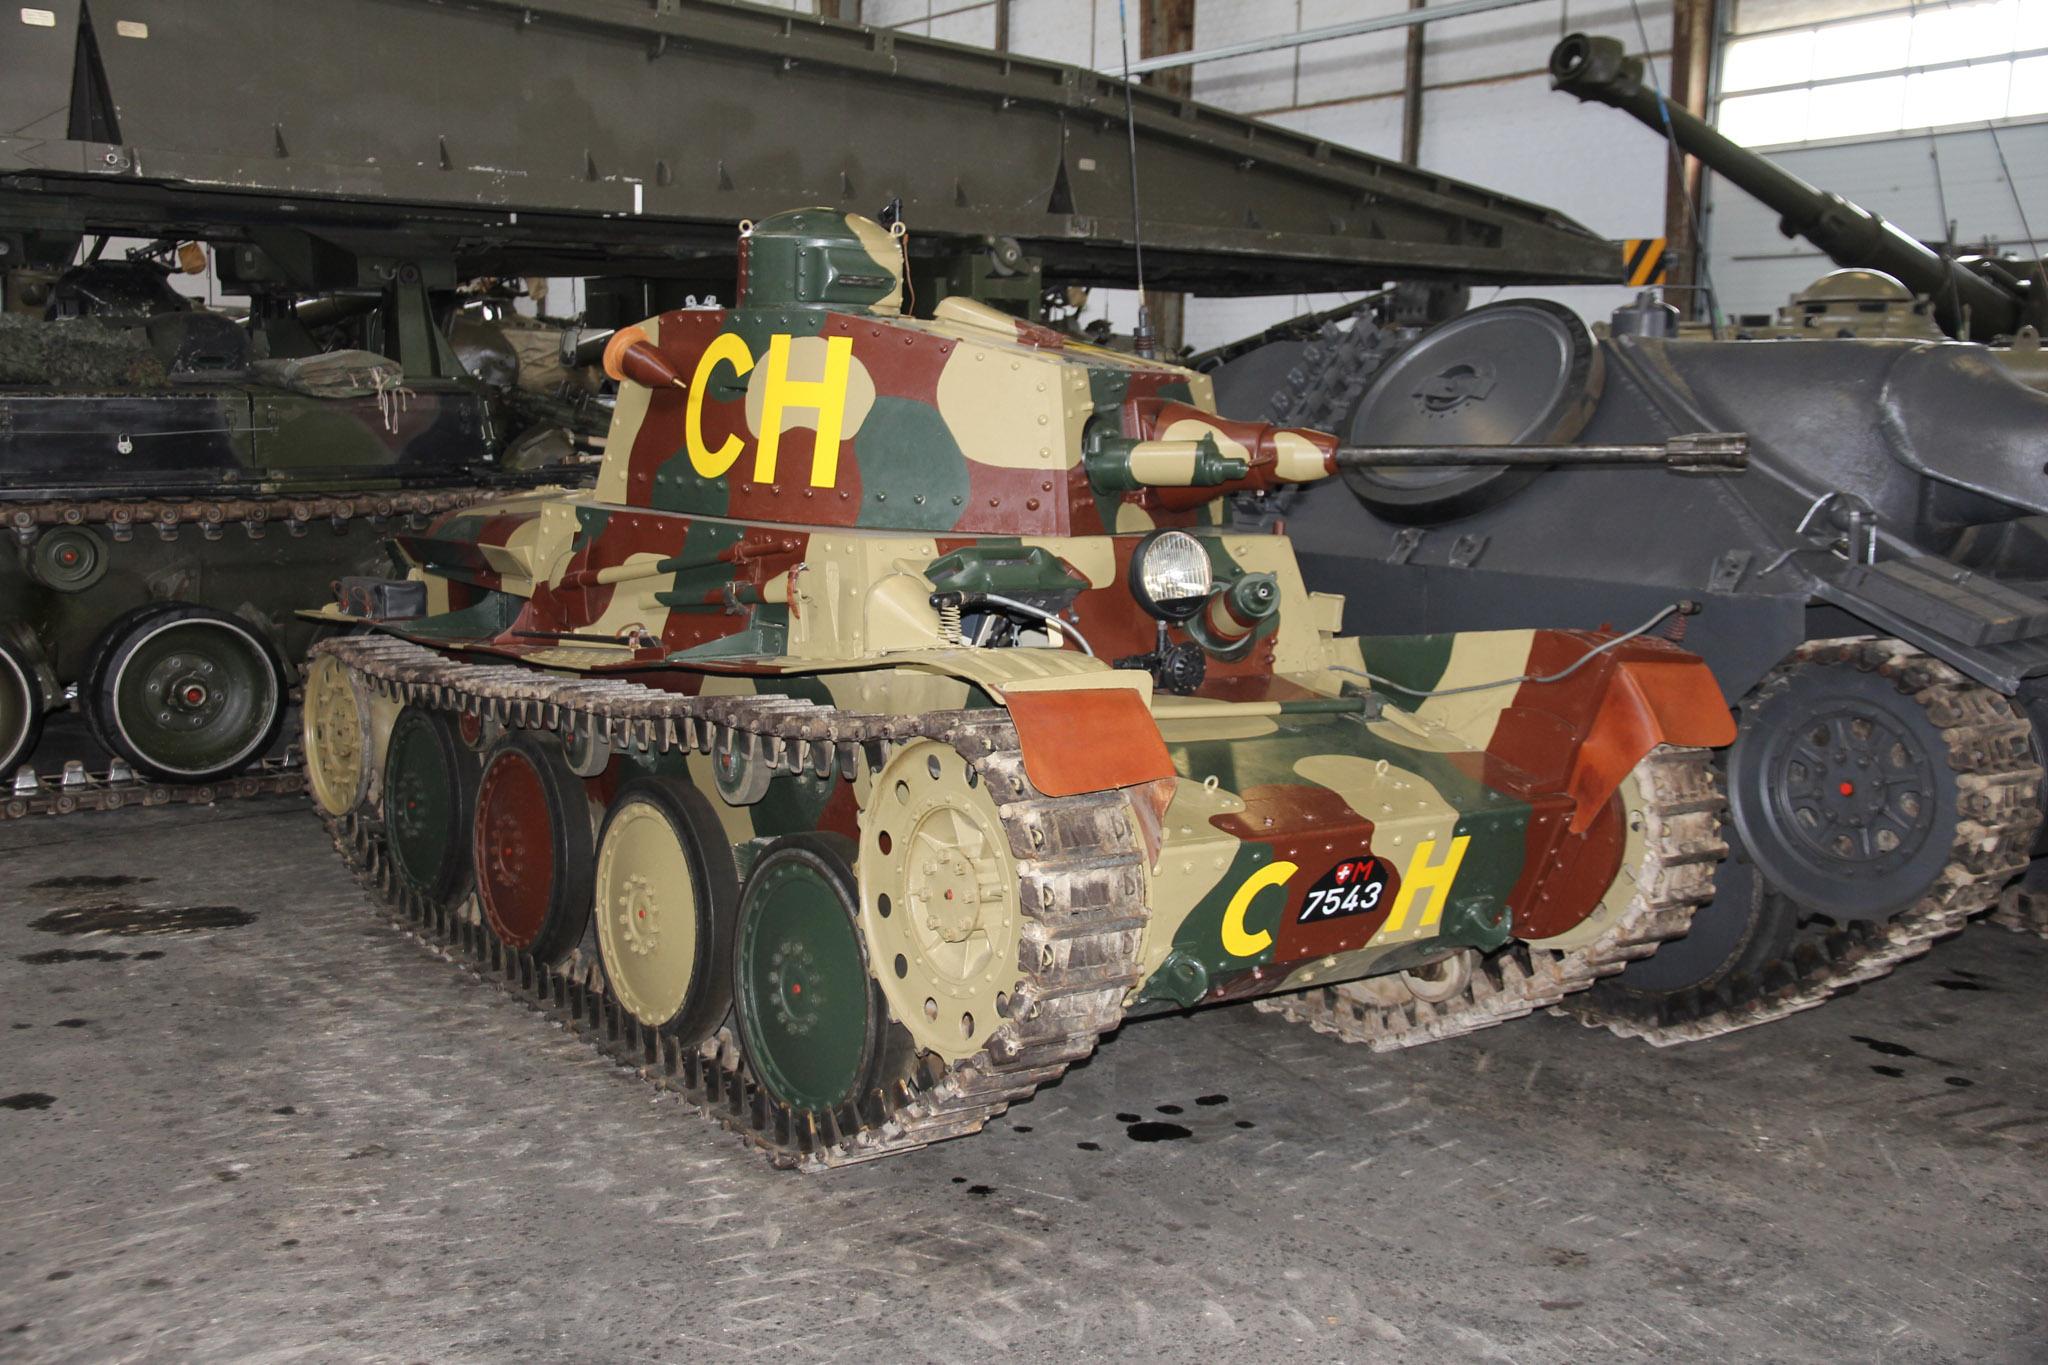 Panzerwagen 39, Militärmuseum Full: yuripasholok — LiveJournal